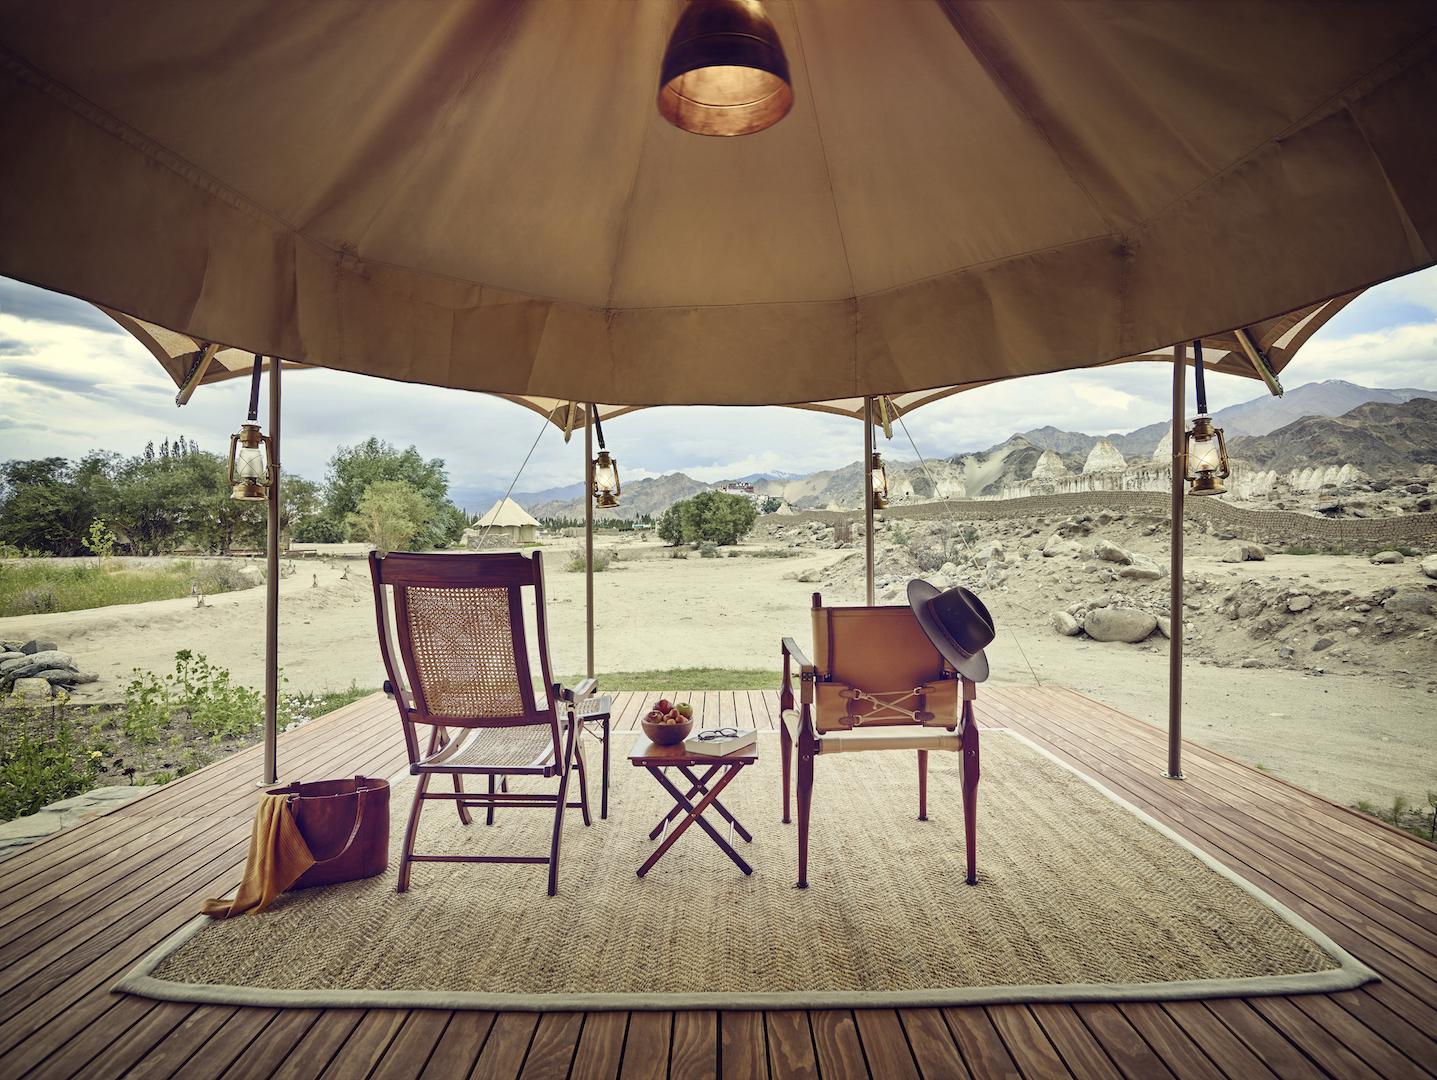 gt-luxury-suite-tent-sand-verandah-02_highres.jpg